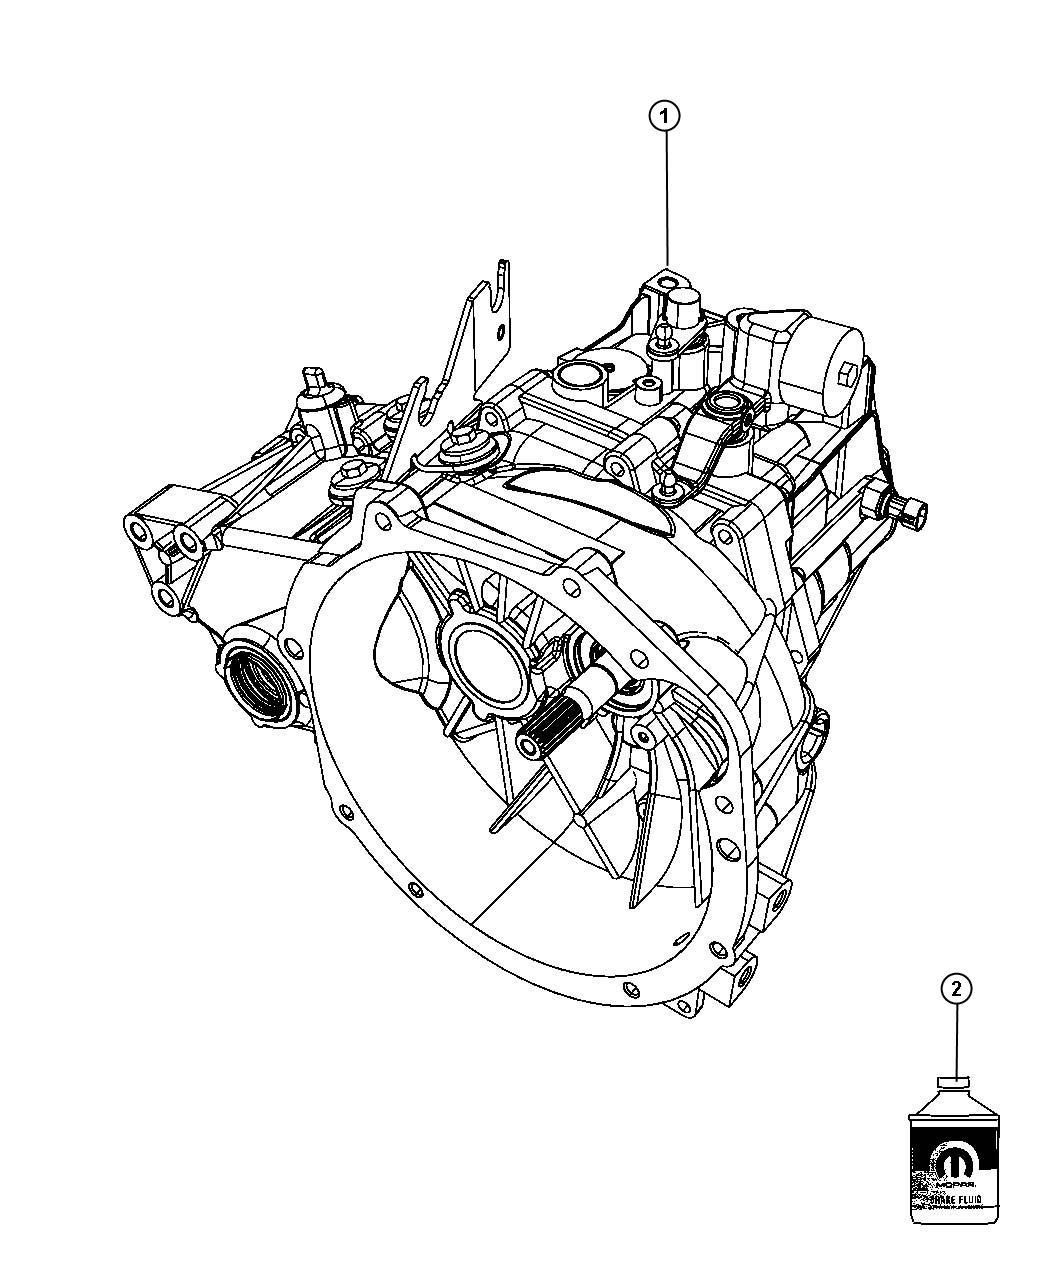 2010 Jeep Compass Transmission: 2010 Dodge Caliber Transmission / Transaxle Assembly